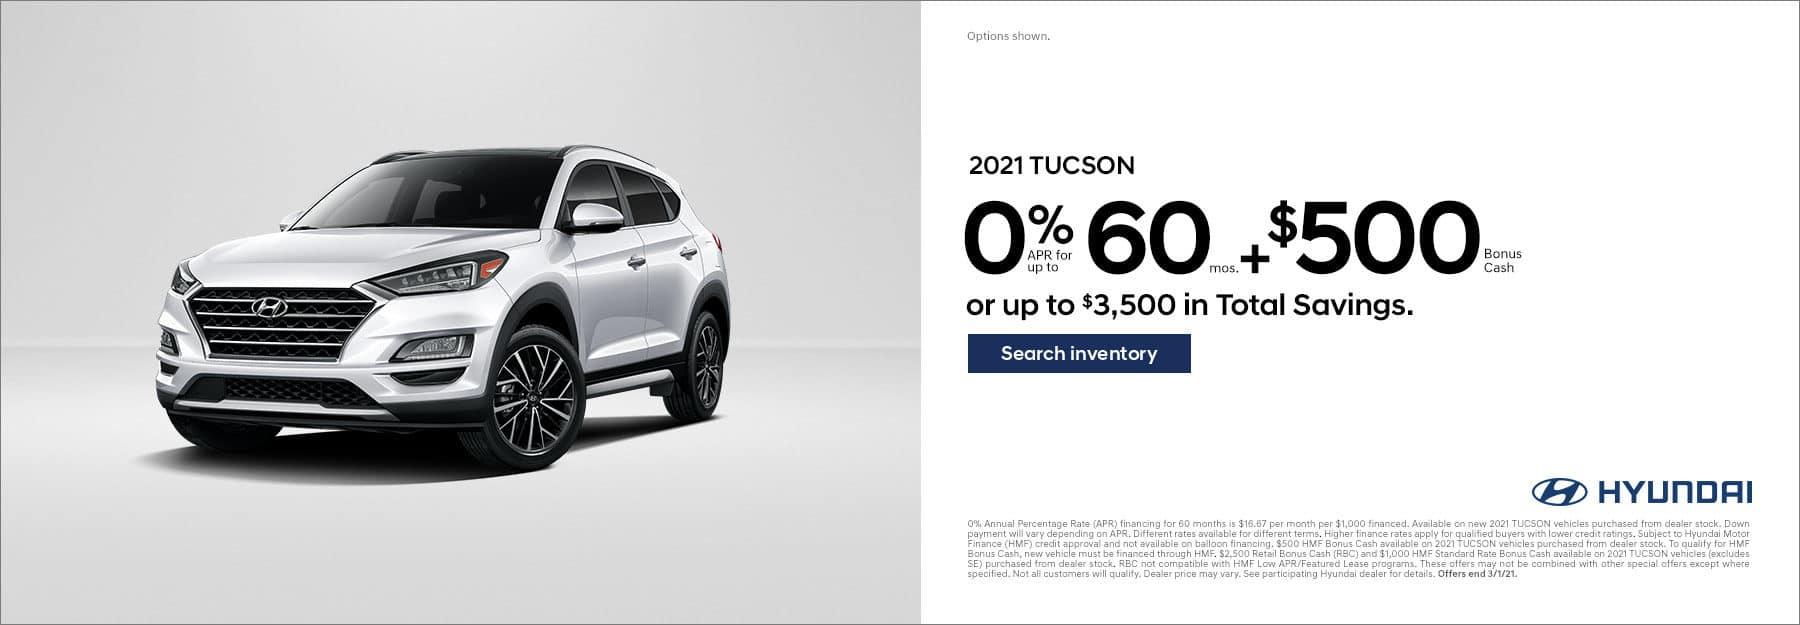 2020 Tucson 0% for 60